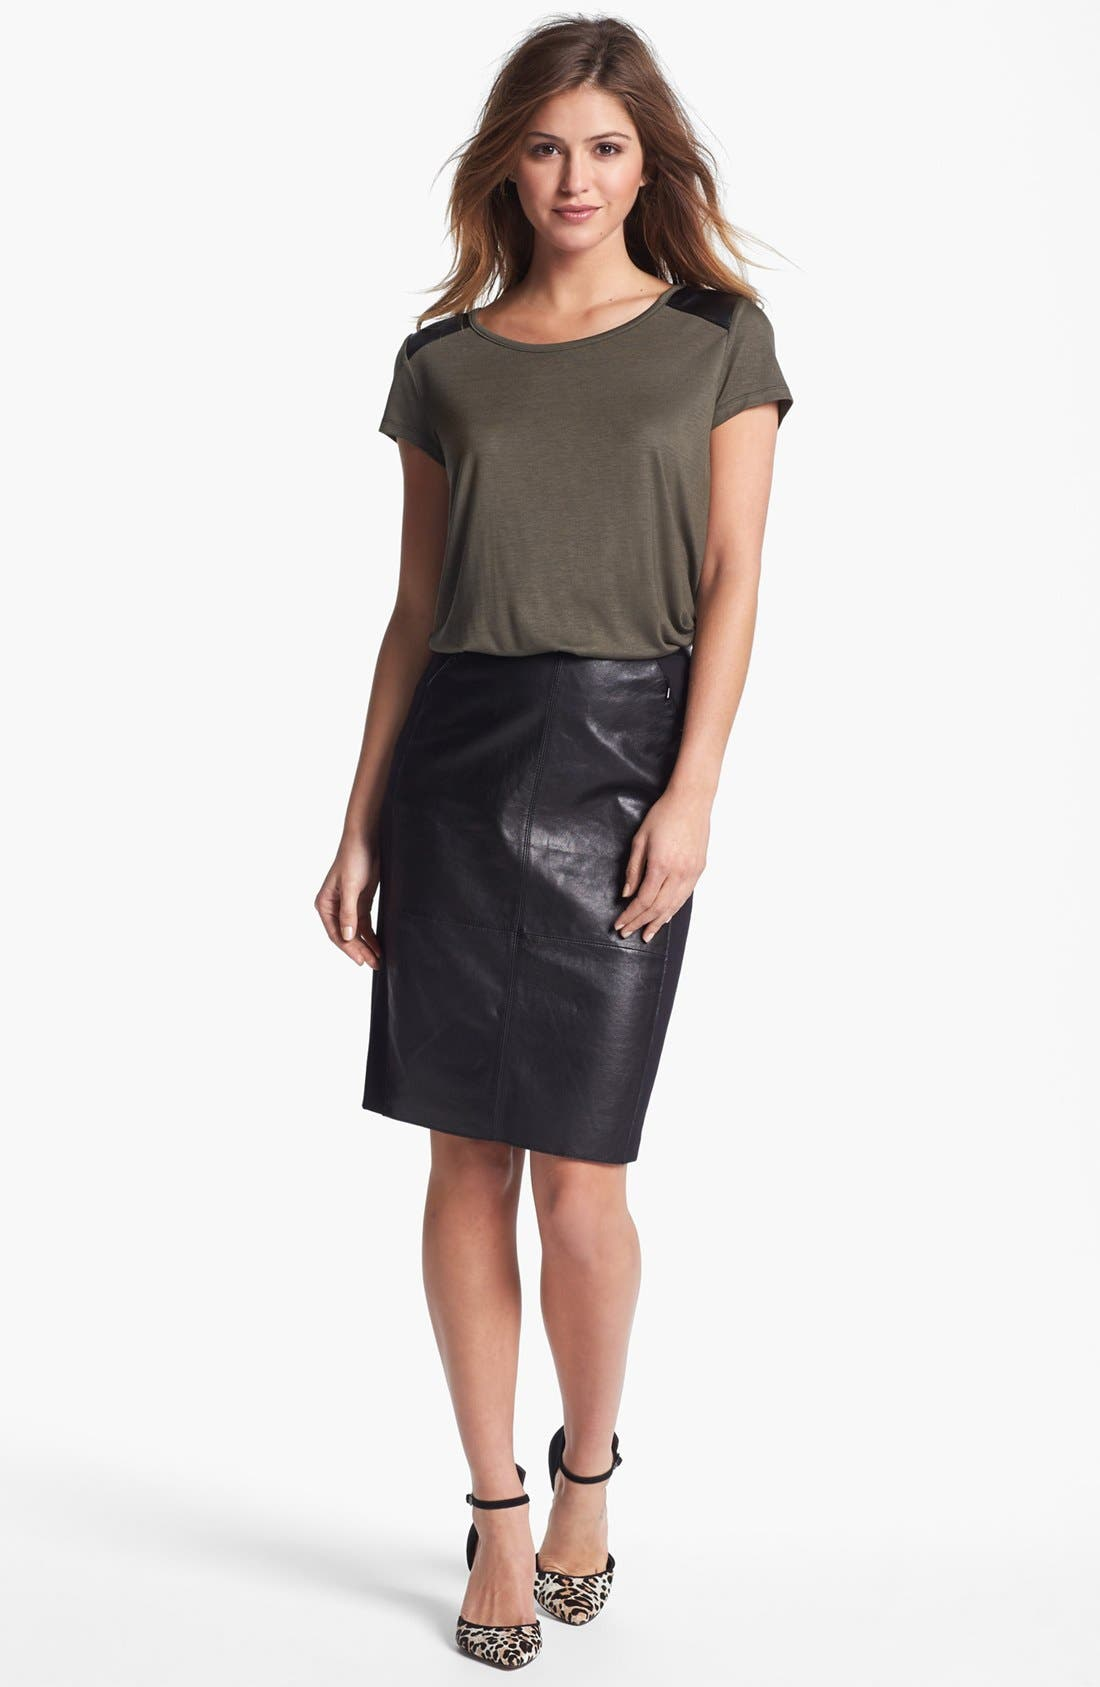 Main Image - Halogen® Tee & Pencil Skirt